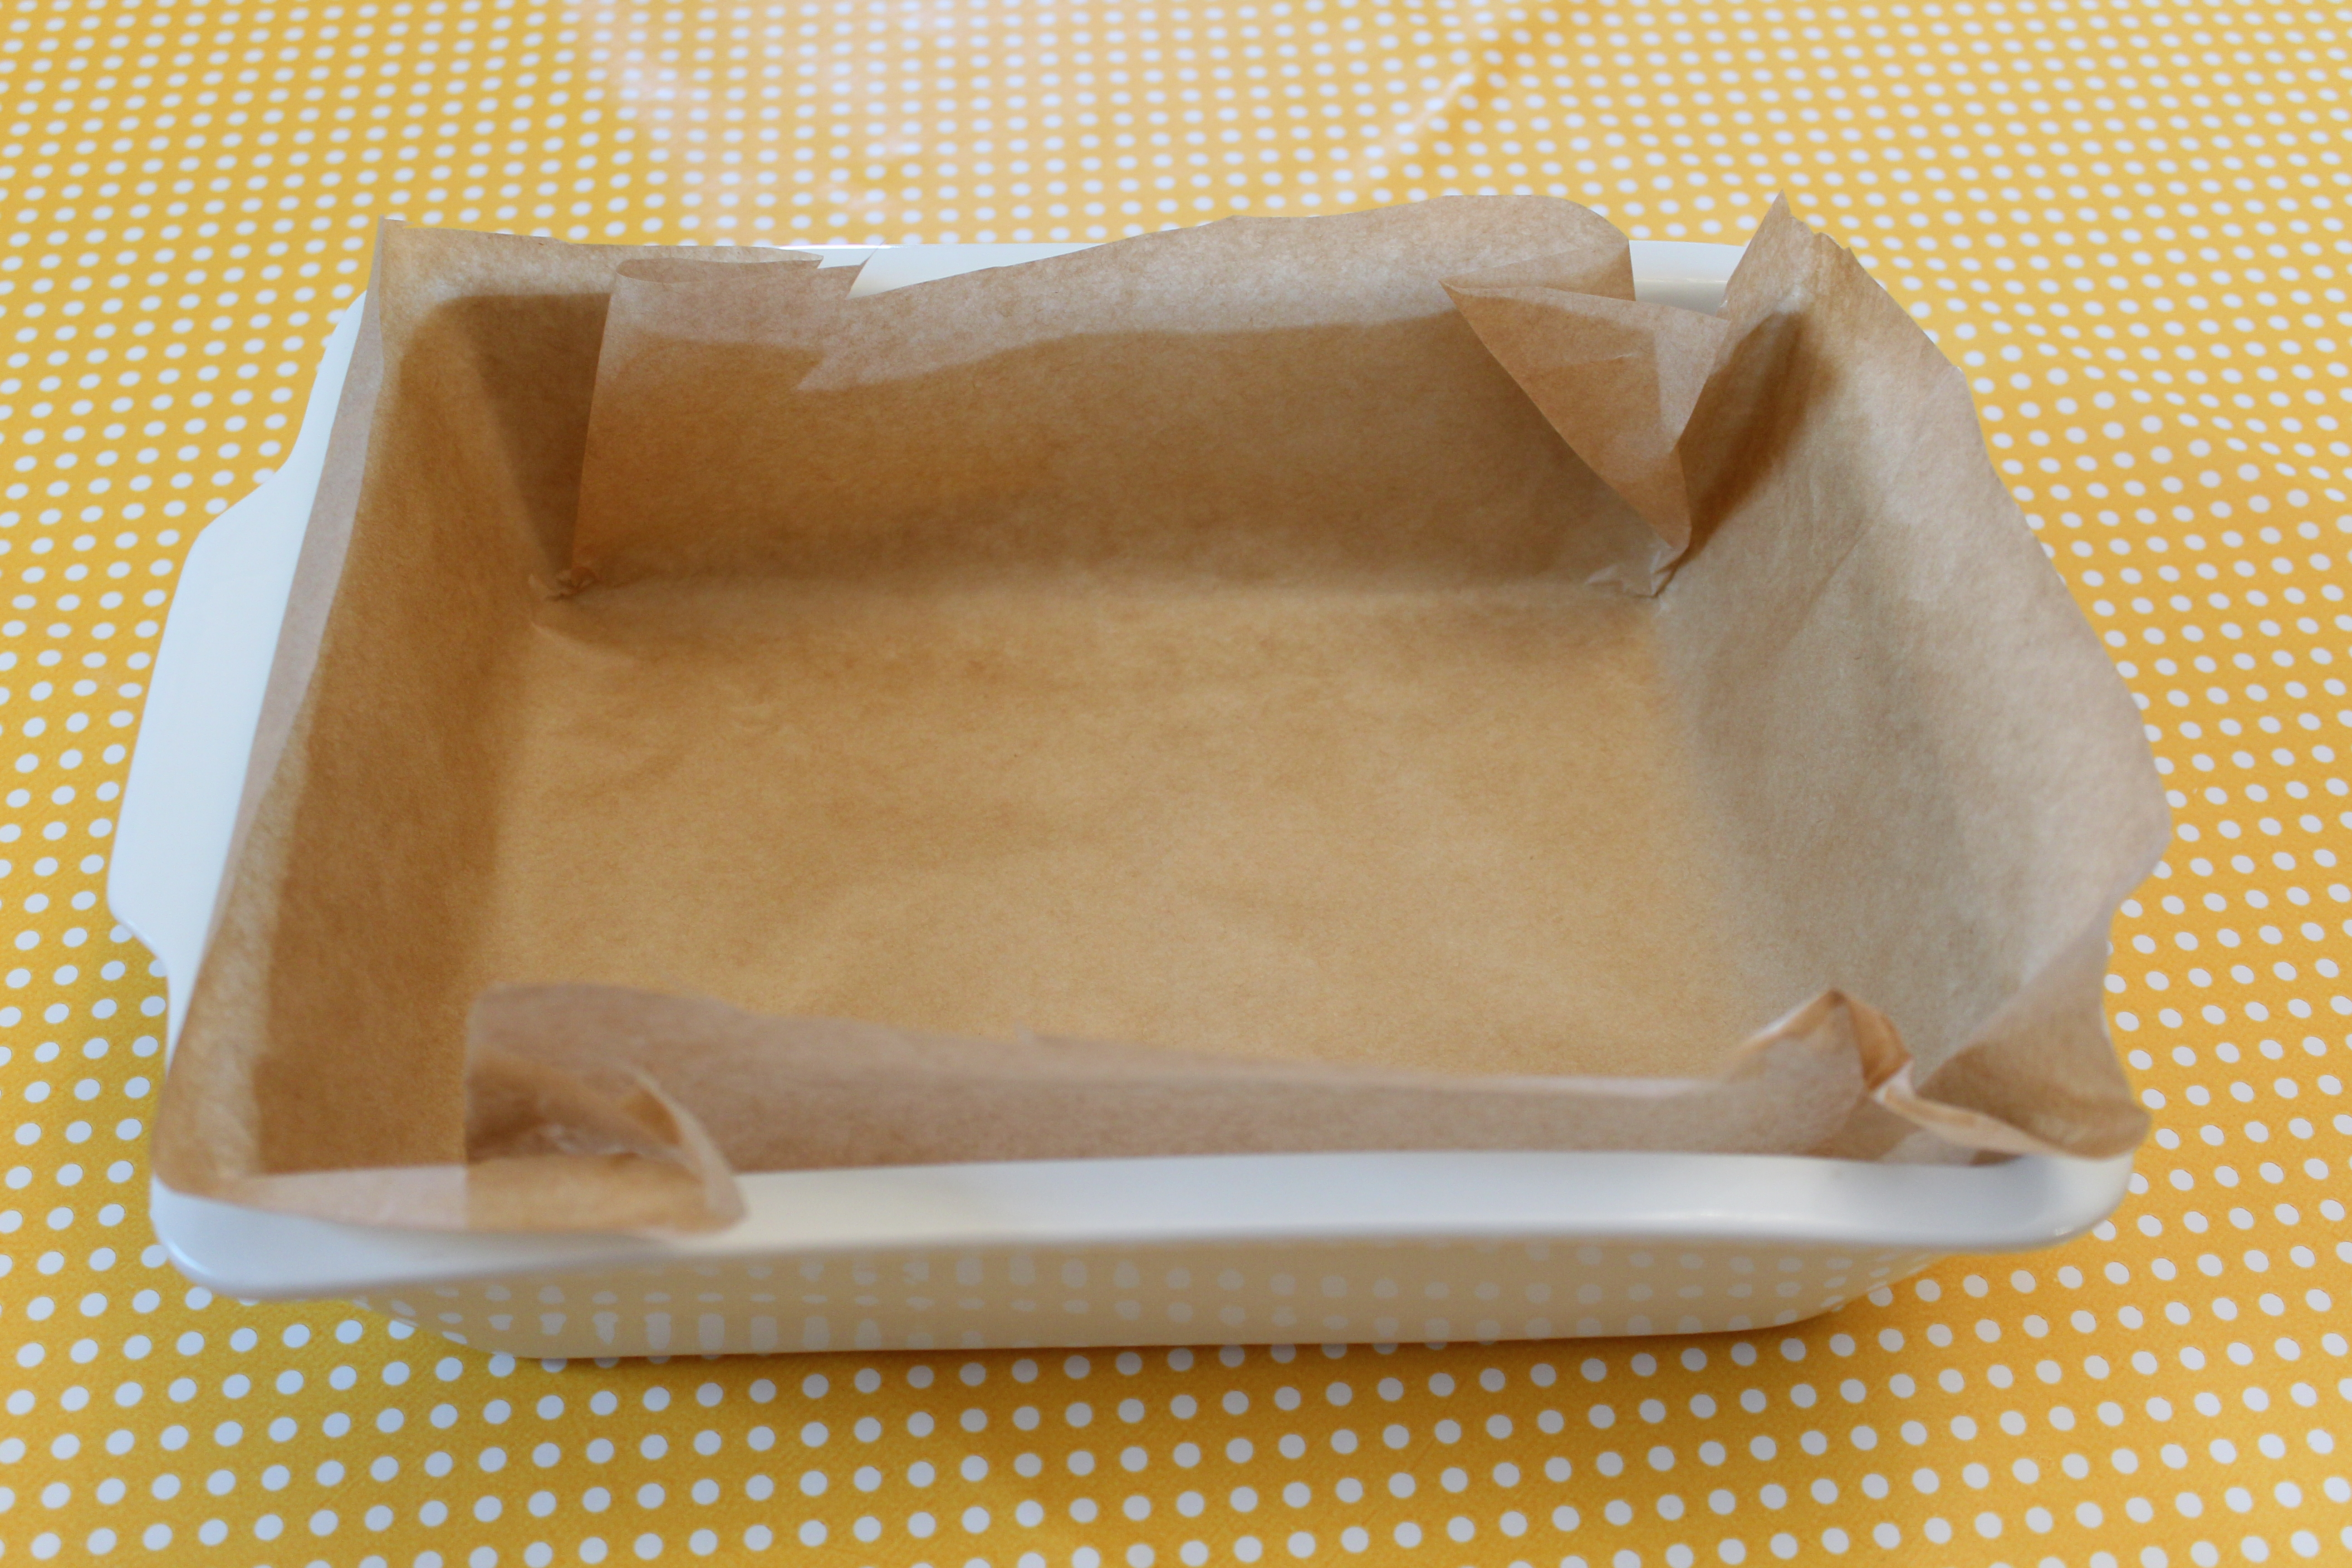 slow cooker crockpot mars bar chocolate fudge (4)